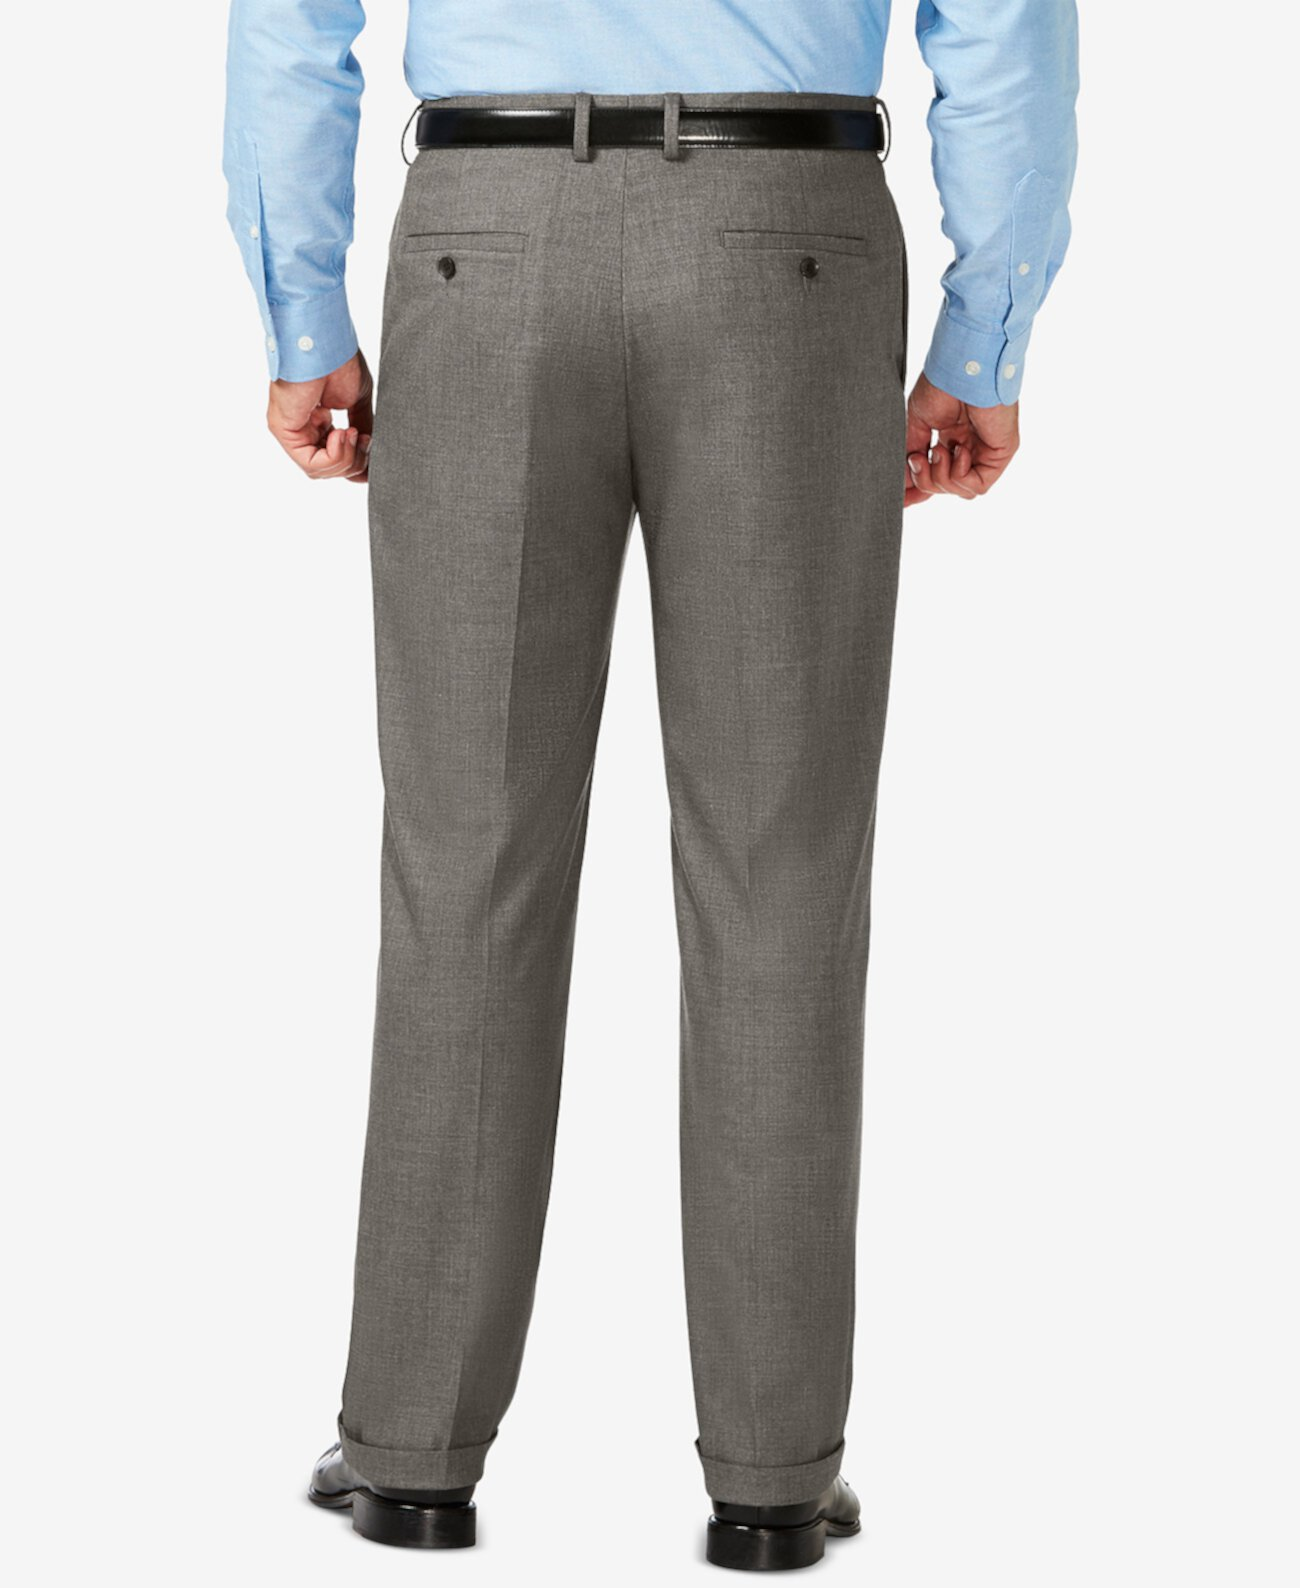 Классические эластичные классические брюки в яркую клетку J.M. Big & Tall HAGGAR